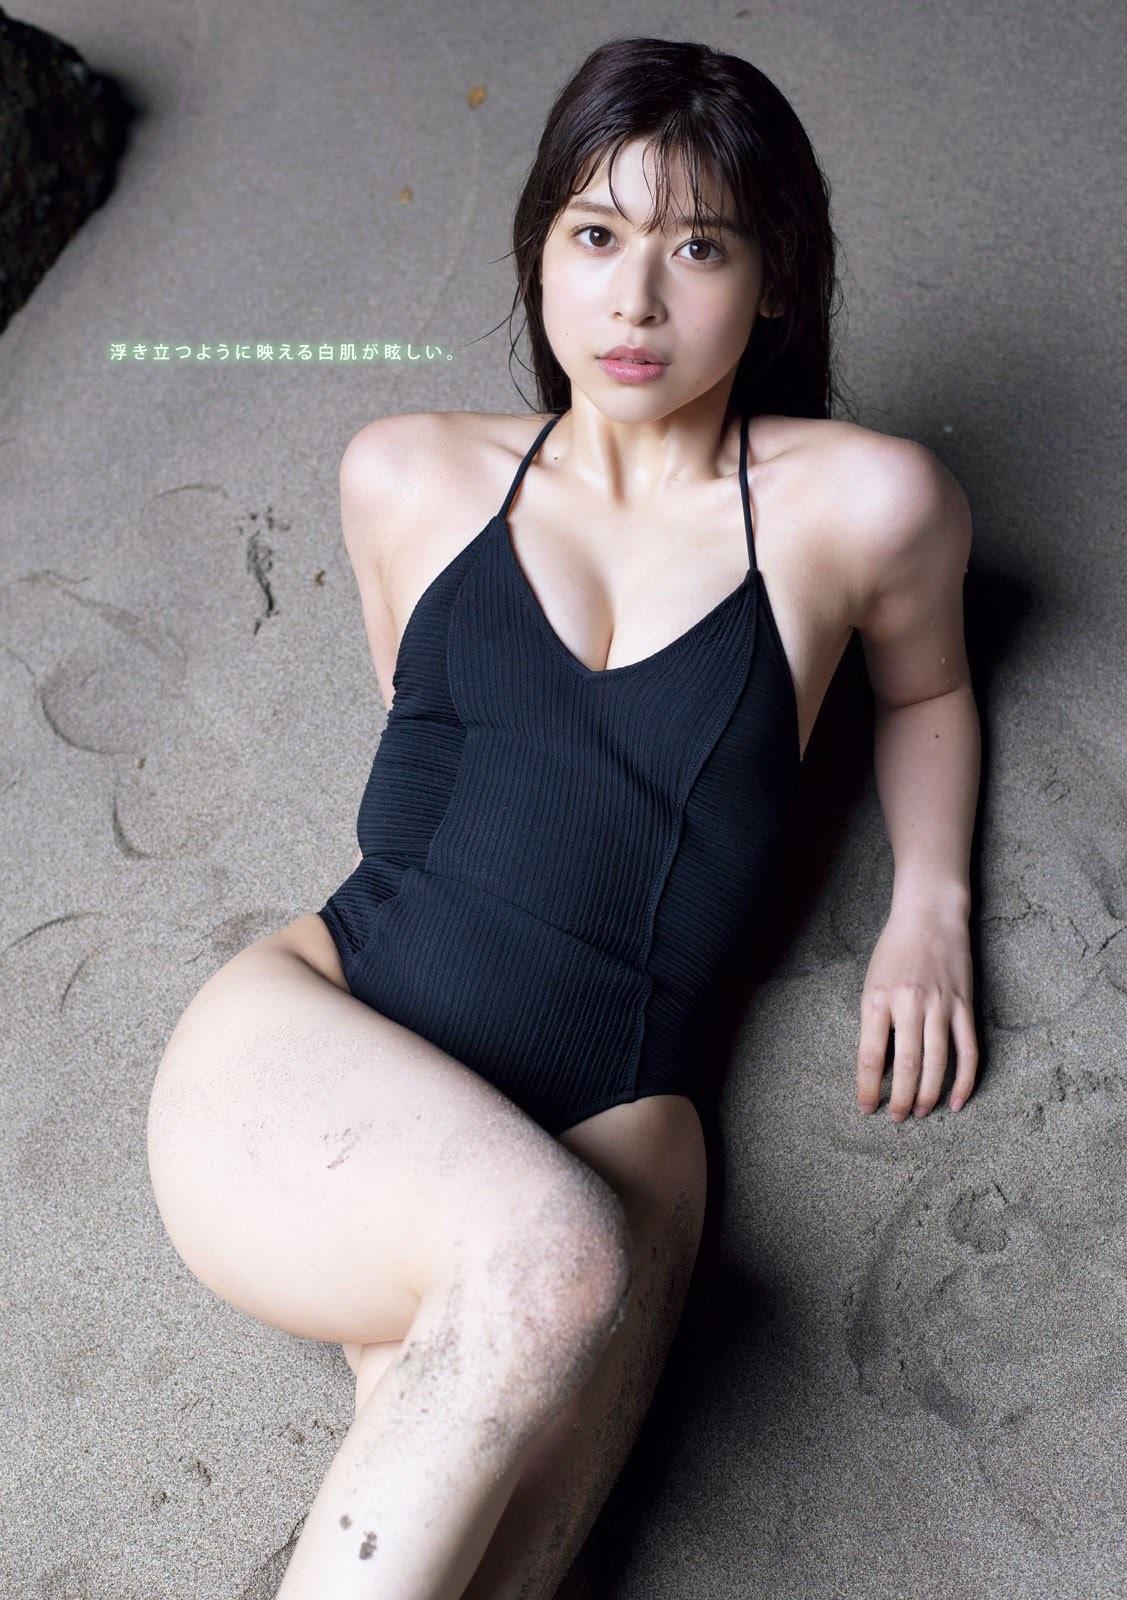 染谷有香-Young Magazine 2021年第二十一期  高清套图 第6张